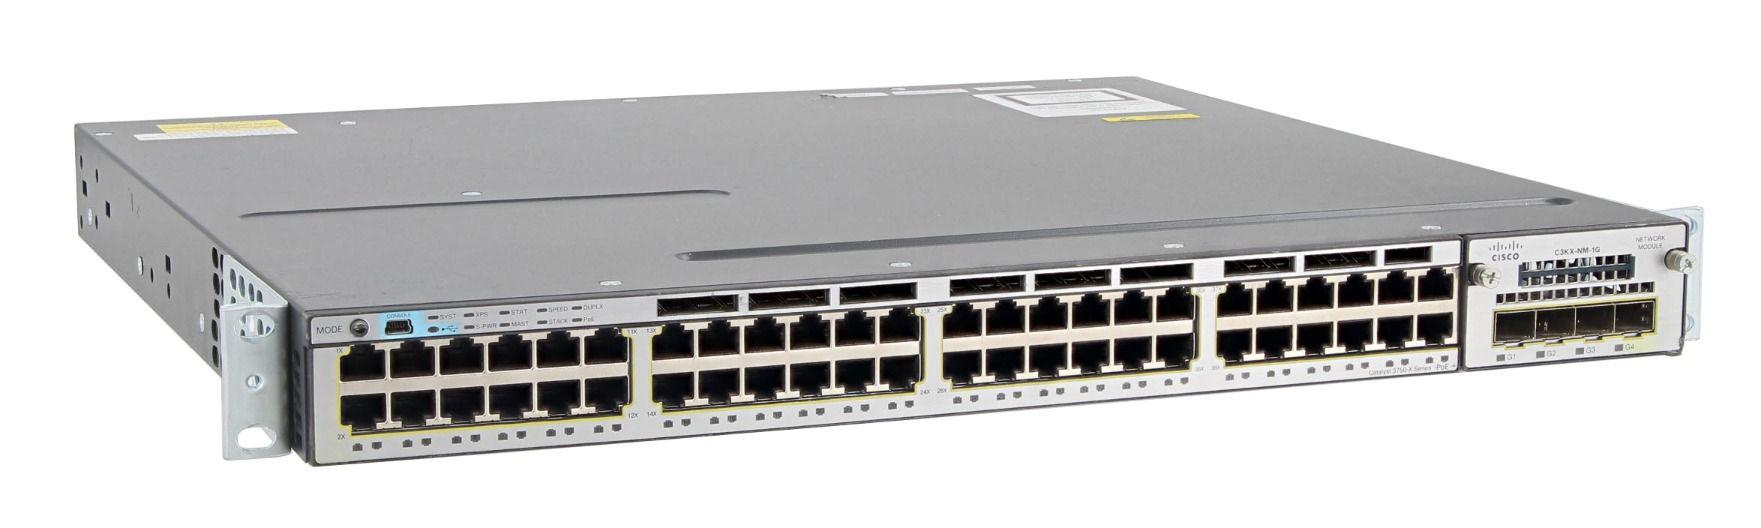 CISCO used Catalyst Switch C3750X-48P-S, 48 ports PoE, managed - CISCO 34385